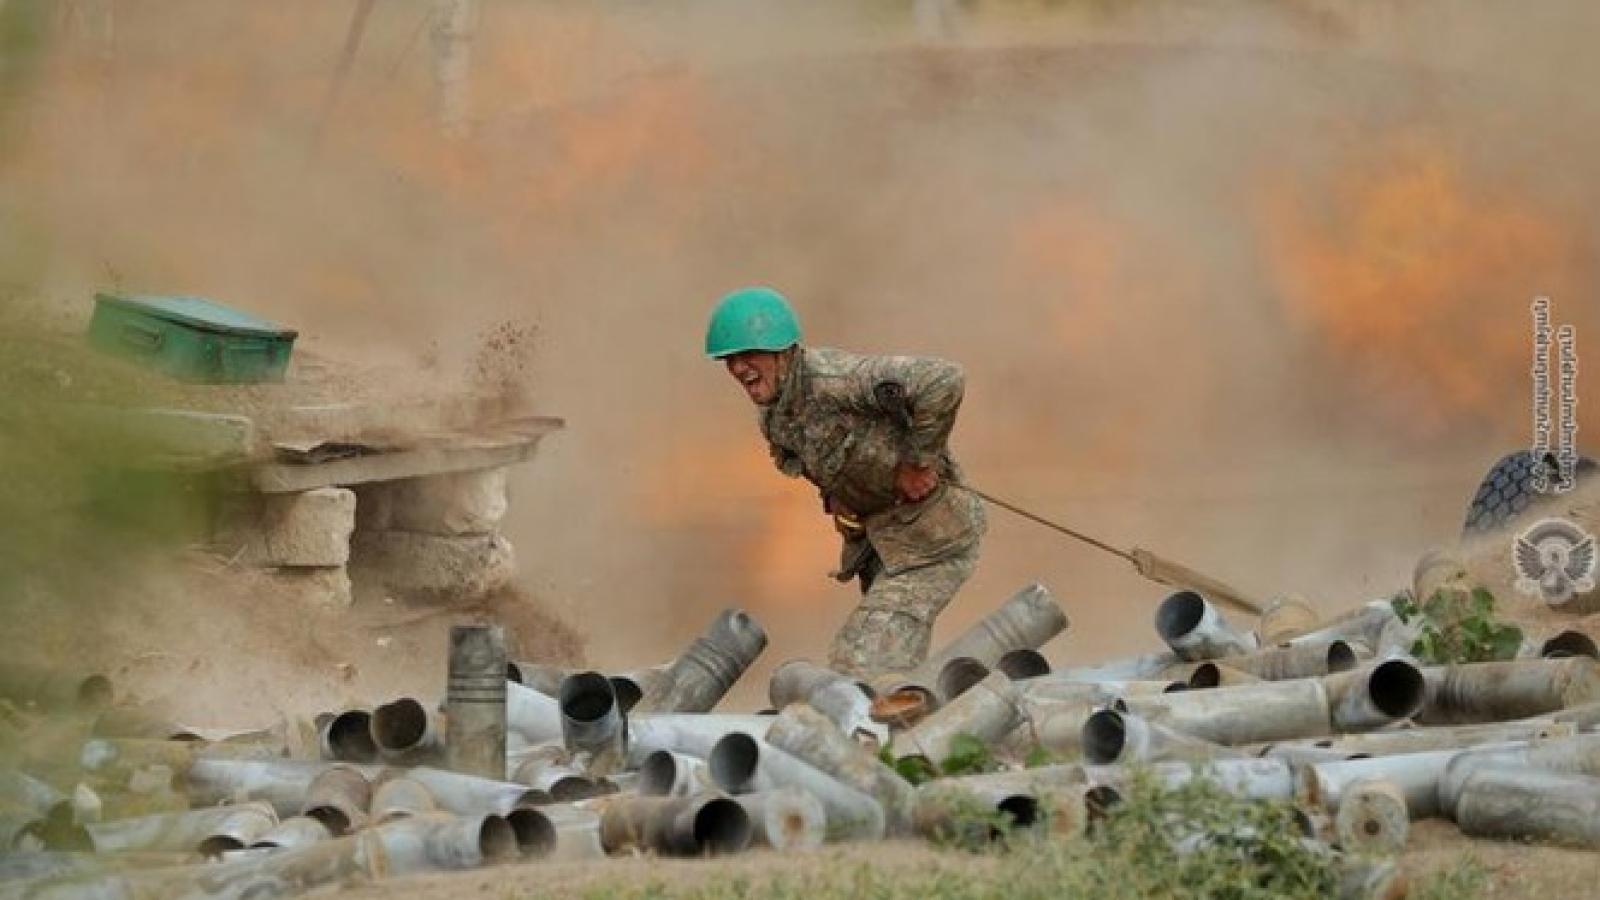 Xung đột Azerbaijan-Armenia: Nước cờ hiểm của Ankara khiến Moscow đau đầu